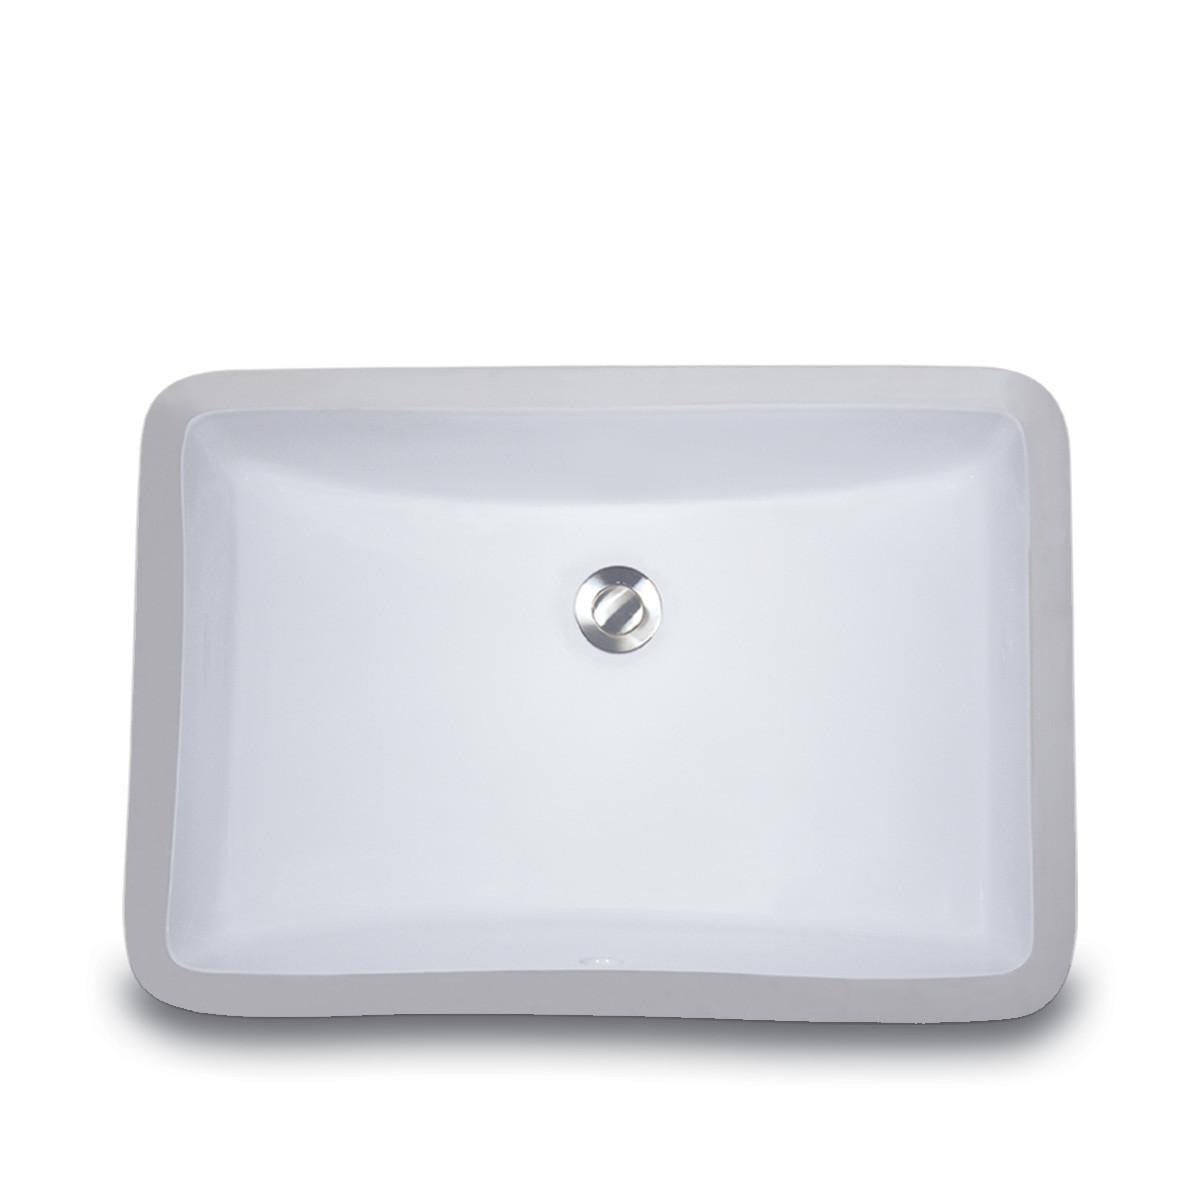 "Nantucket UM-18x12 White 20 1/2"" Rectangular Undermount Bathroom Porcelain Sink"